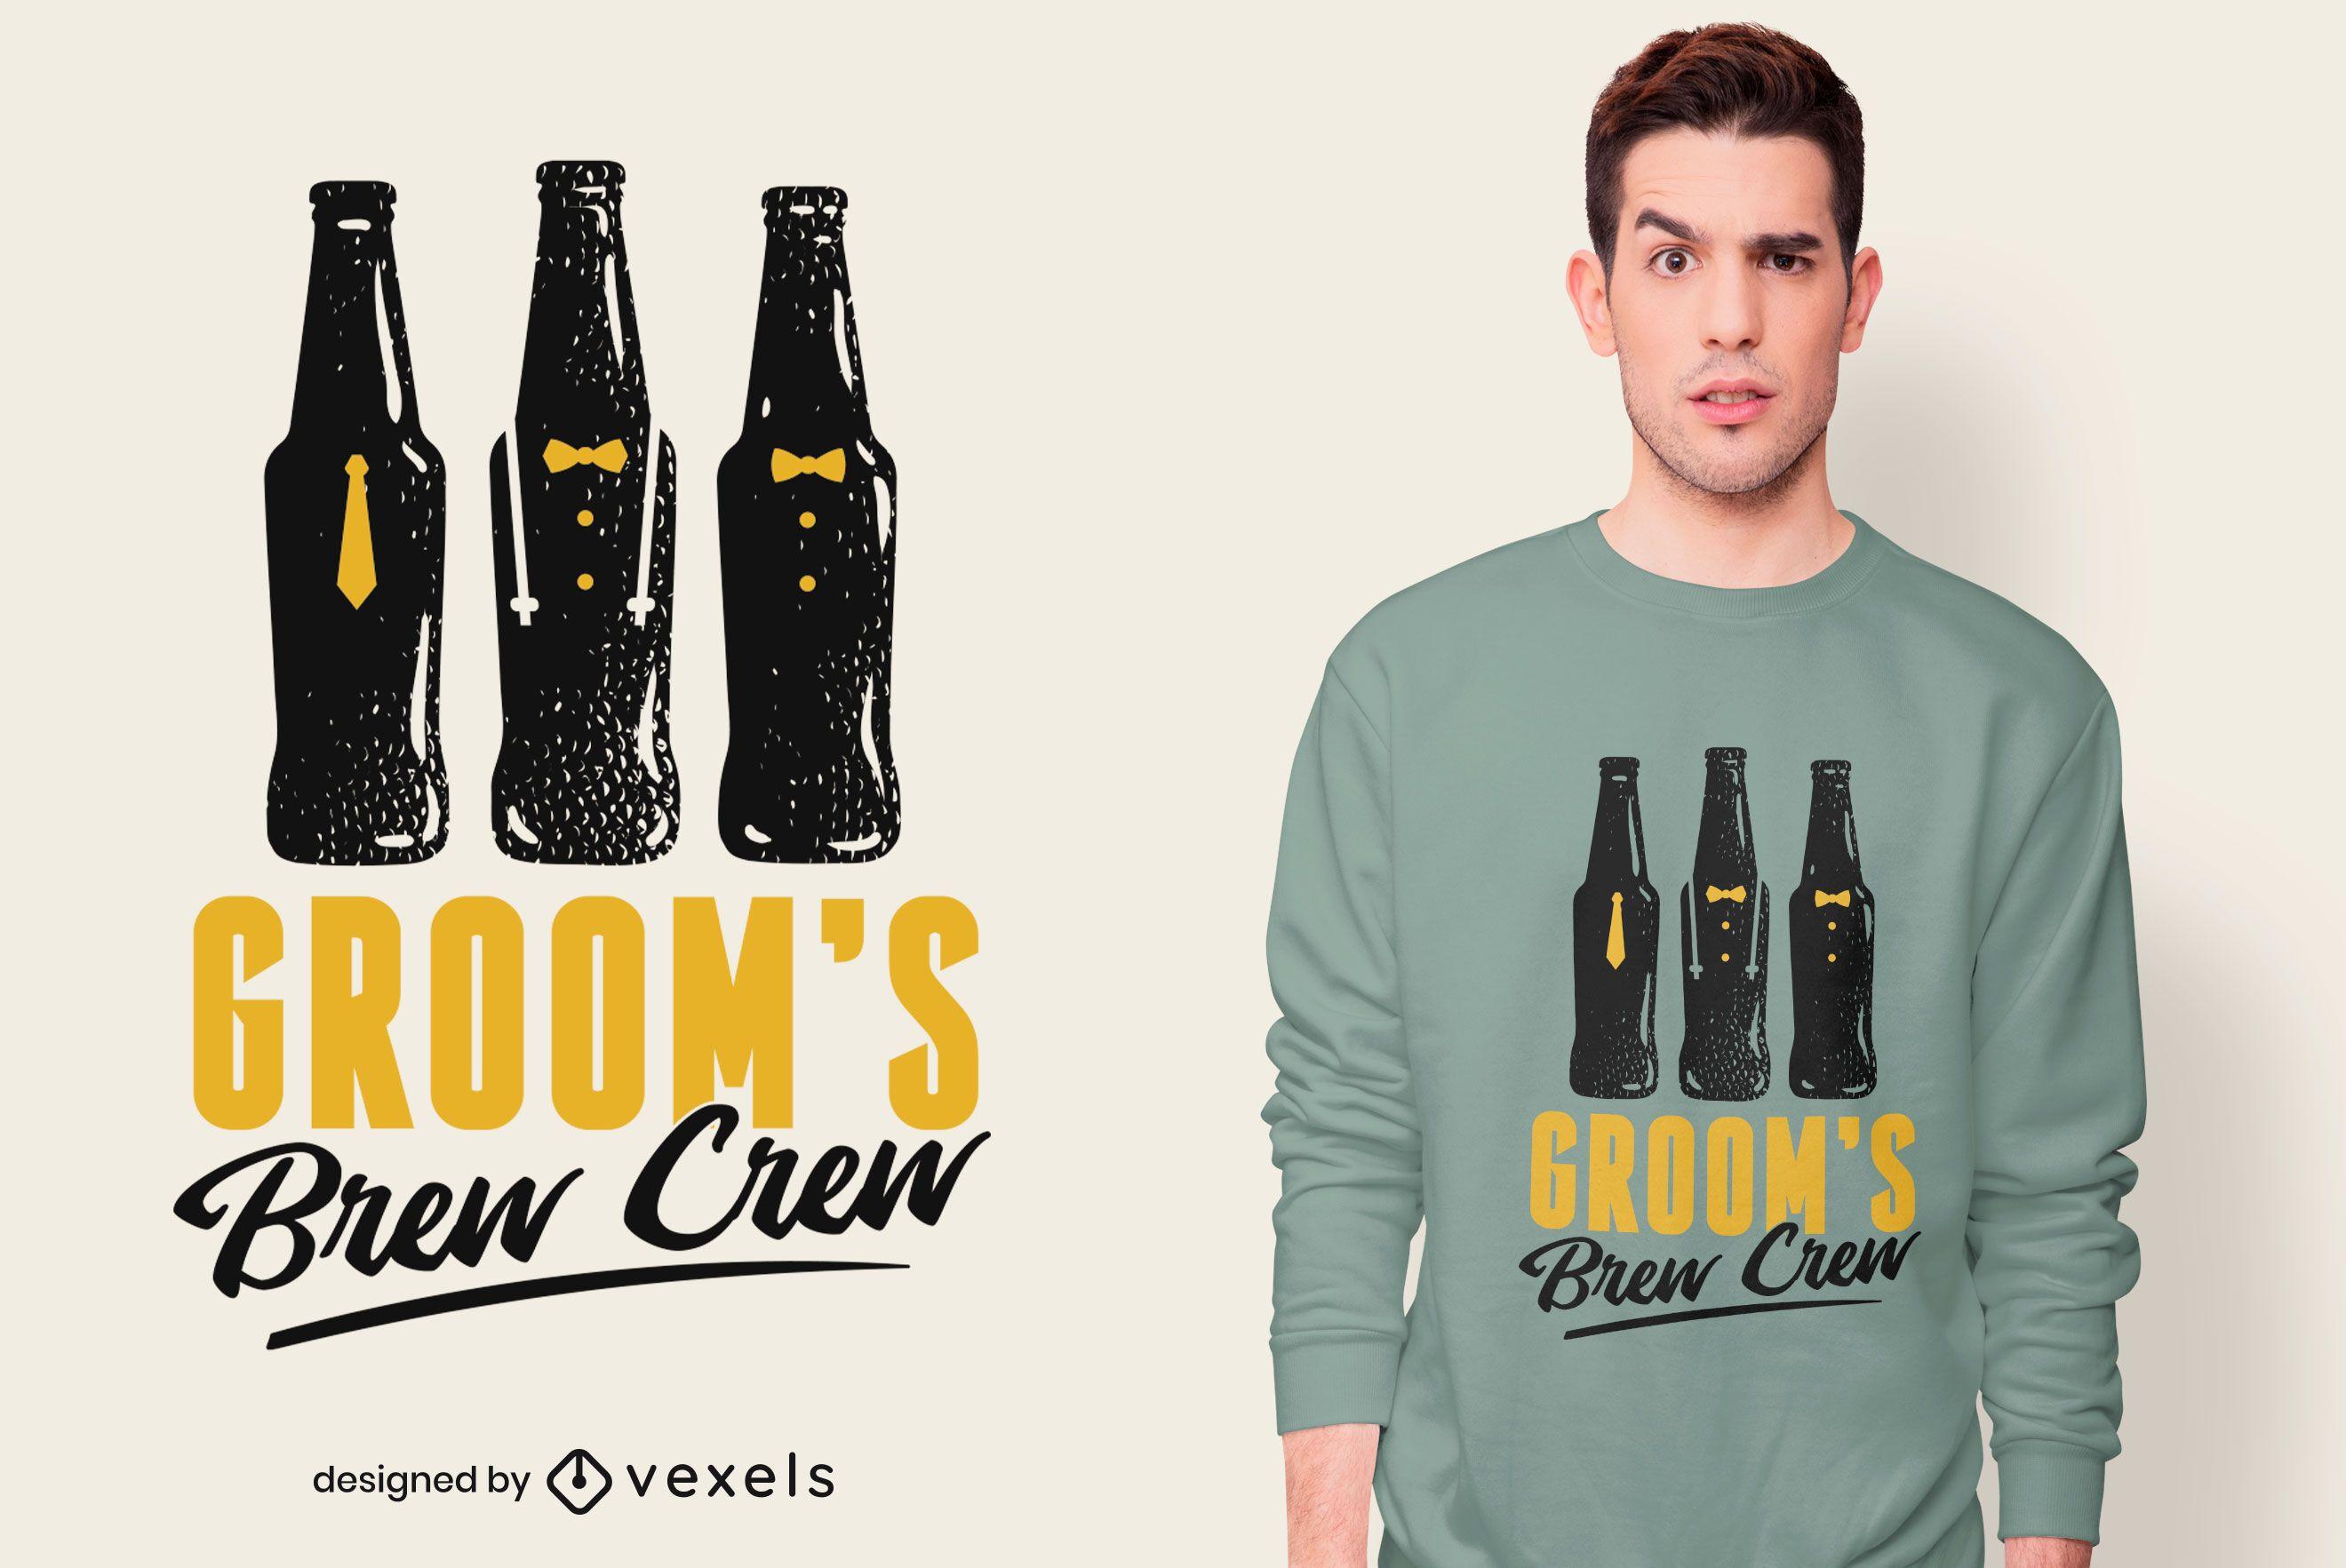 Dise?o de camiseta de Groom's Brew Crew.